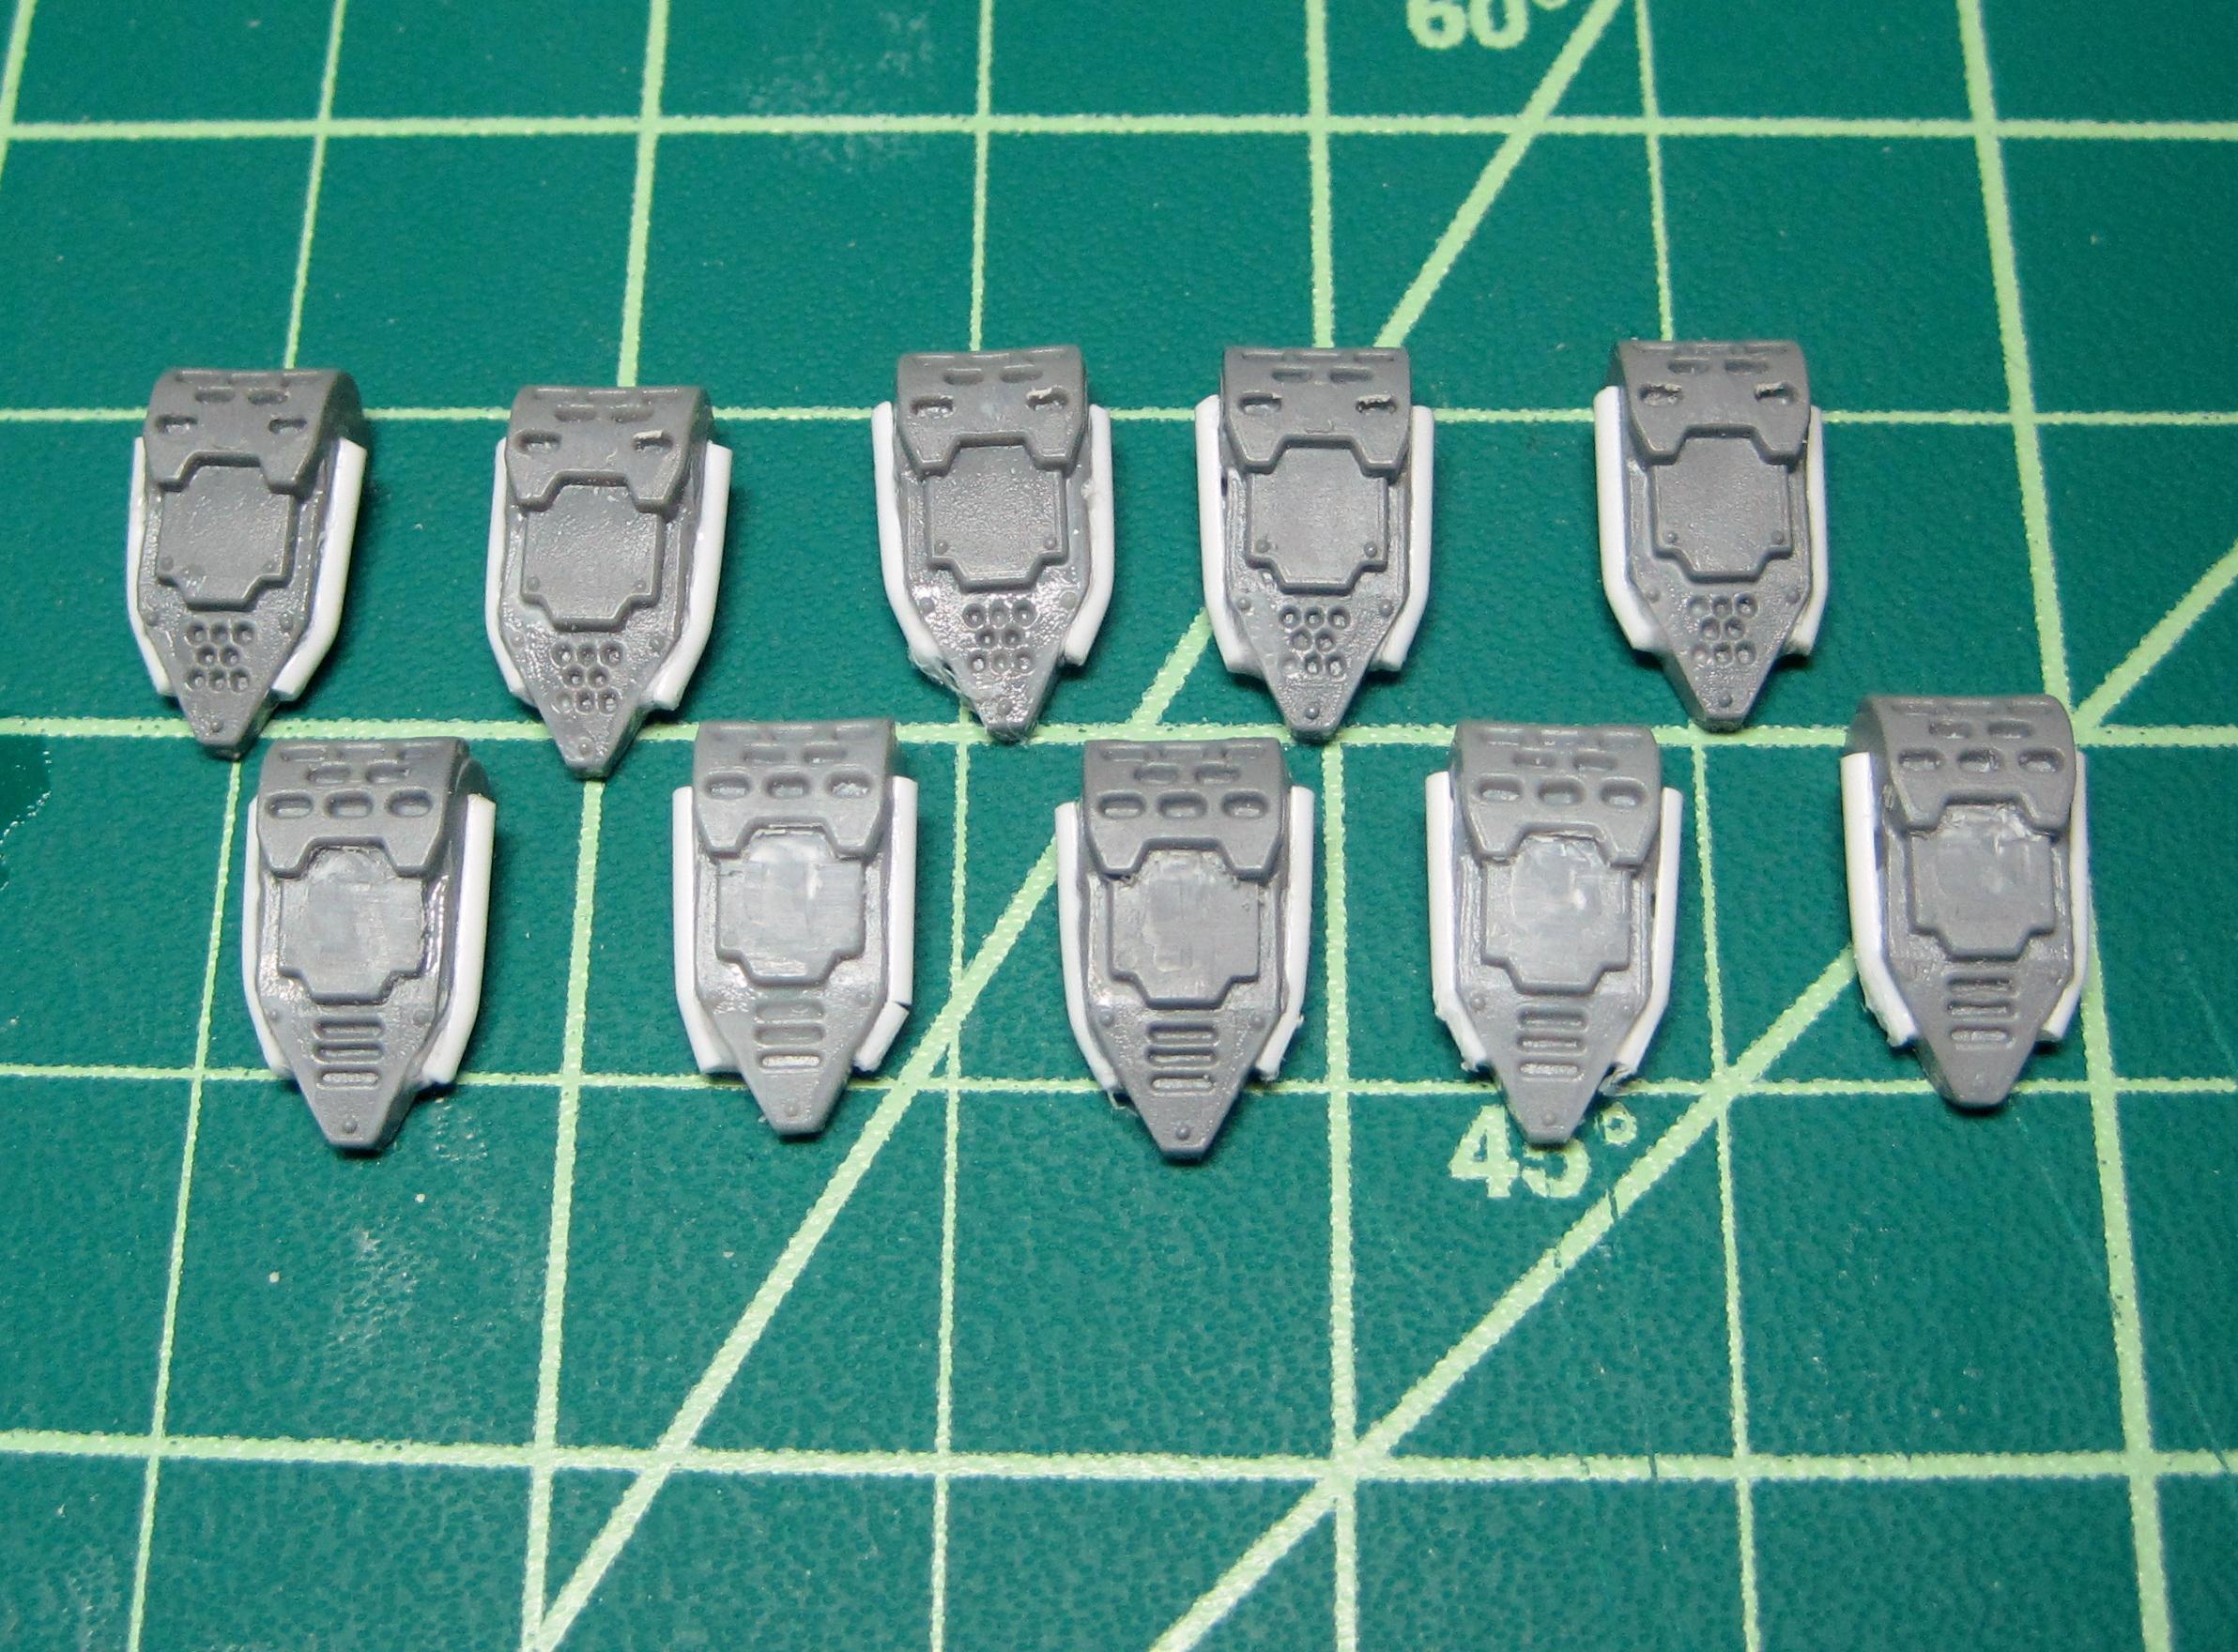 Tac Squad Ultra - Backpacks all Ten